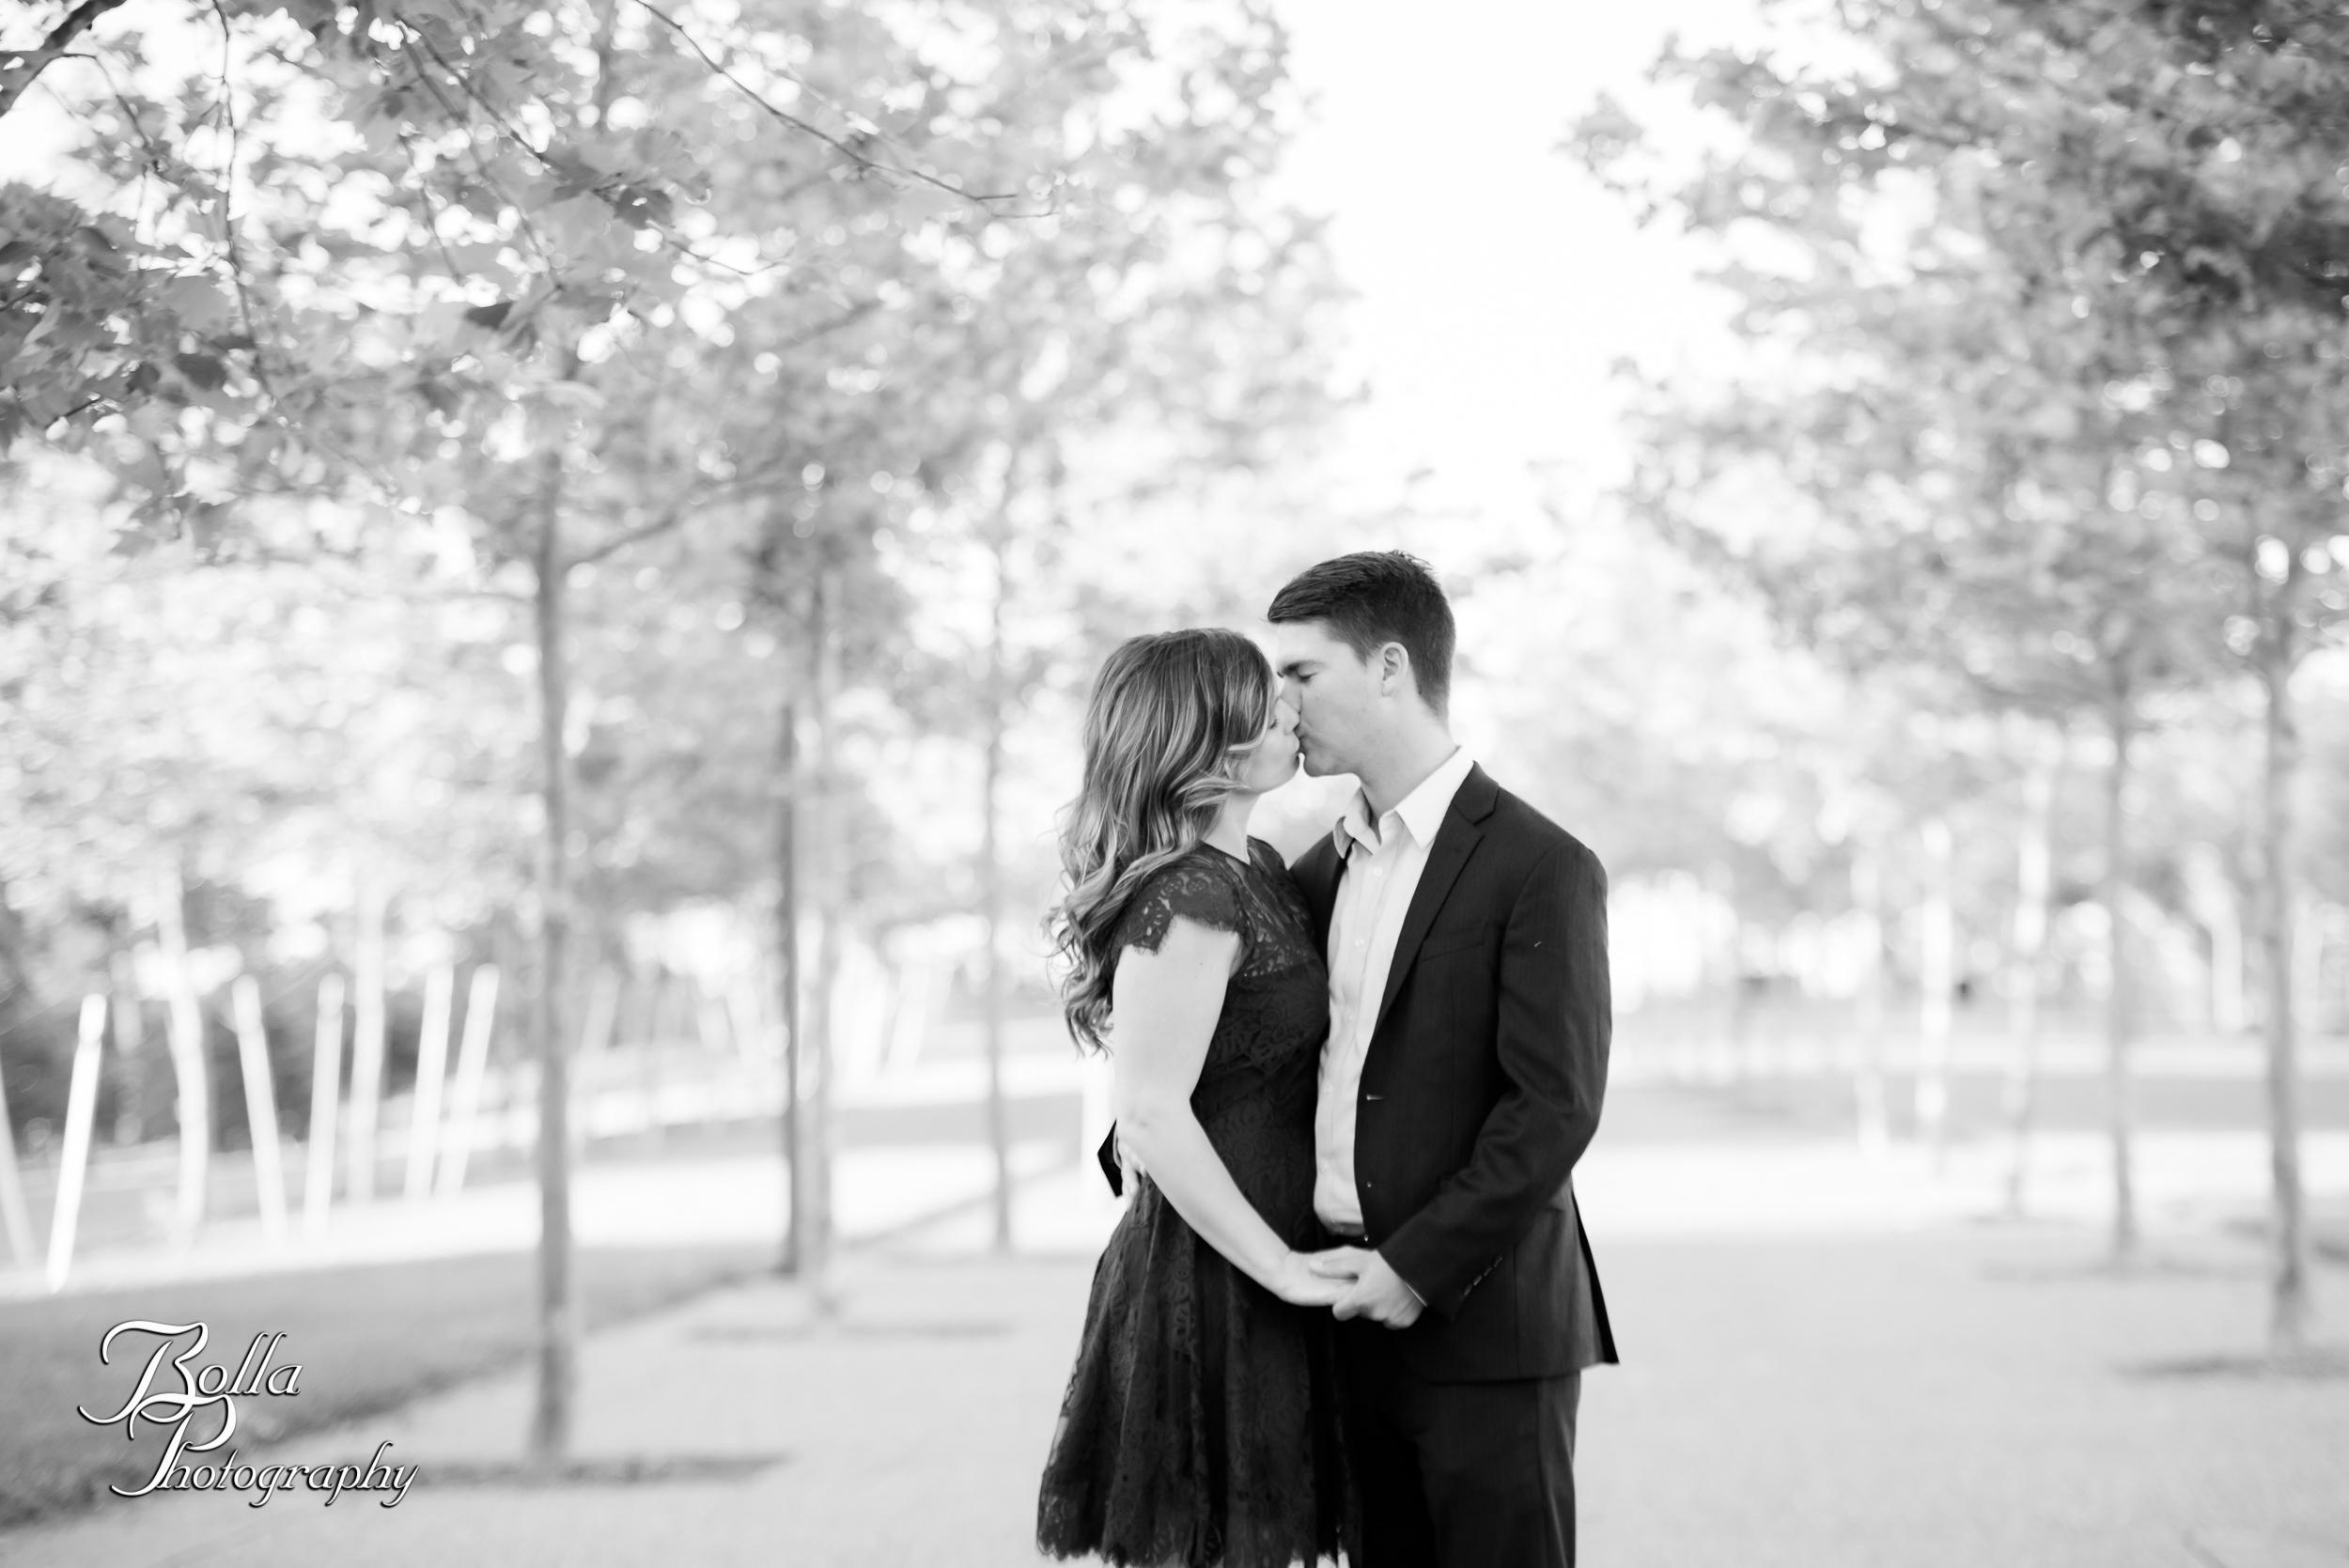 20170528_Bolla photography edwardsville wedding newborn baby photographer st louis weddings babies-2.jpg